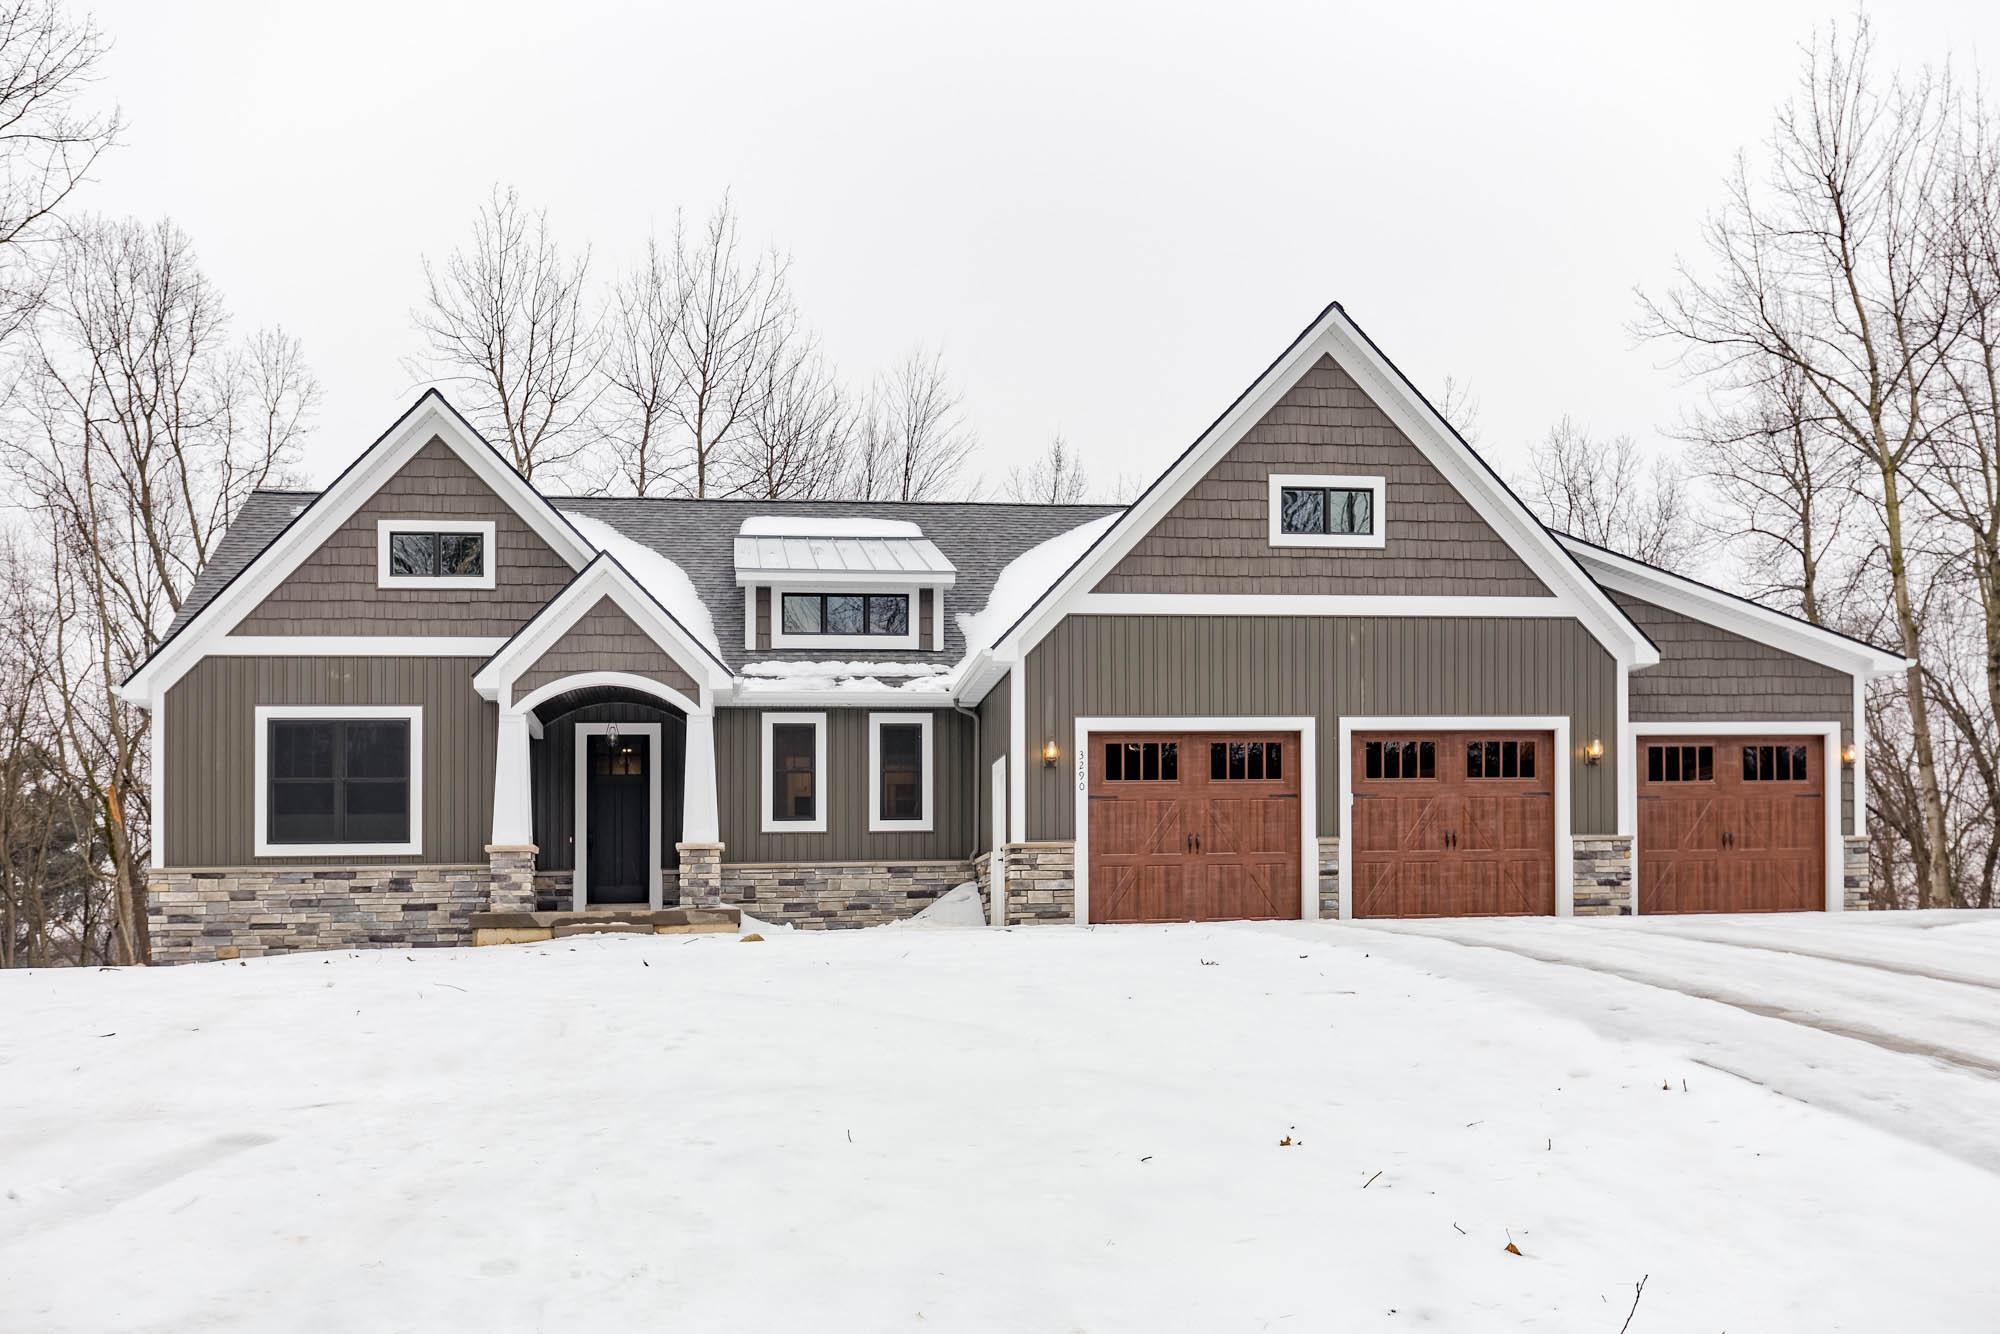 Steps to building a custom home - 8 Steps To Winterize Your Custom Home Whitmore Homes Grand Rapids Custom Home Builders